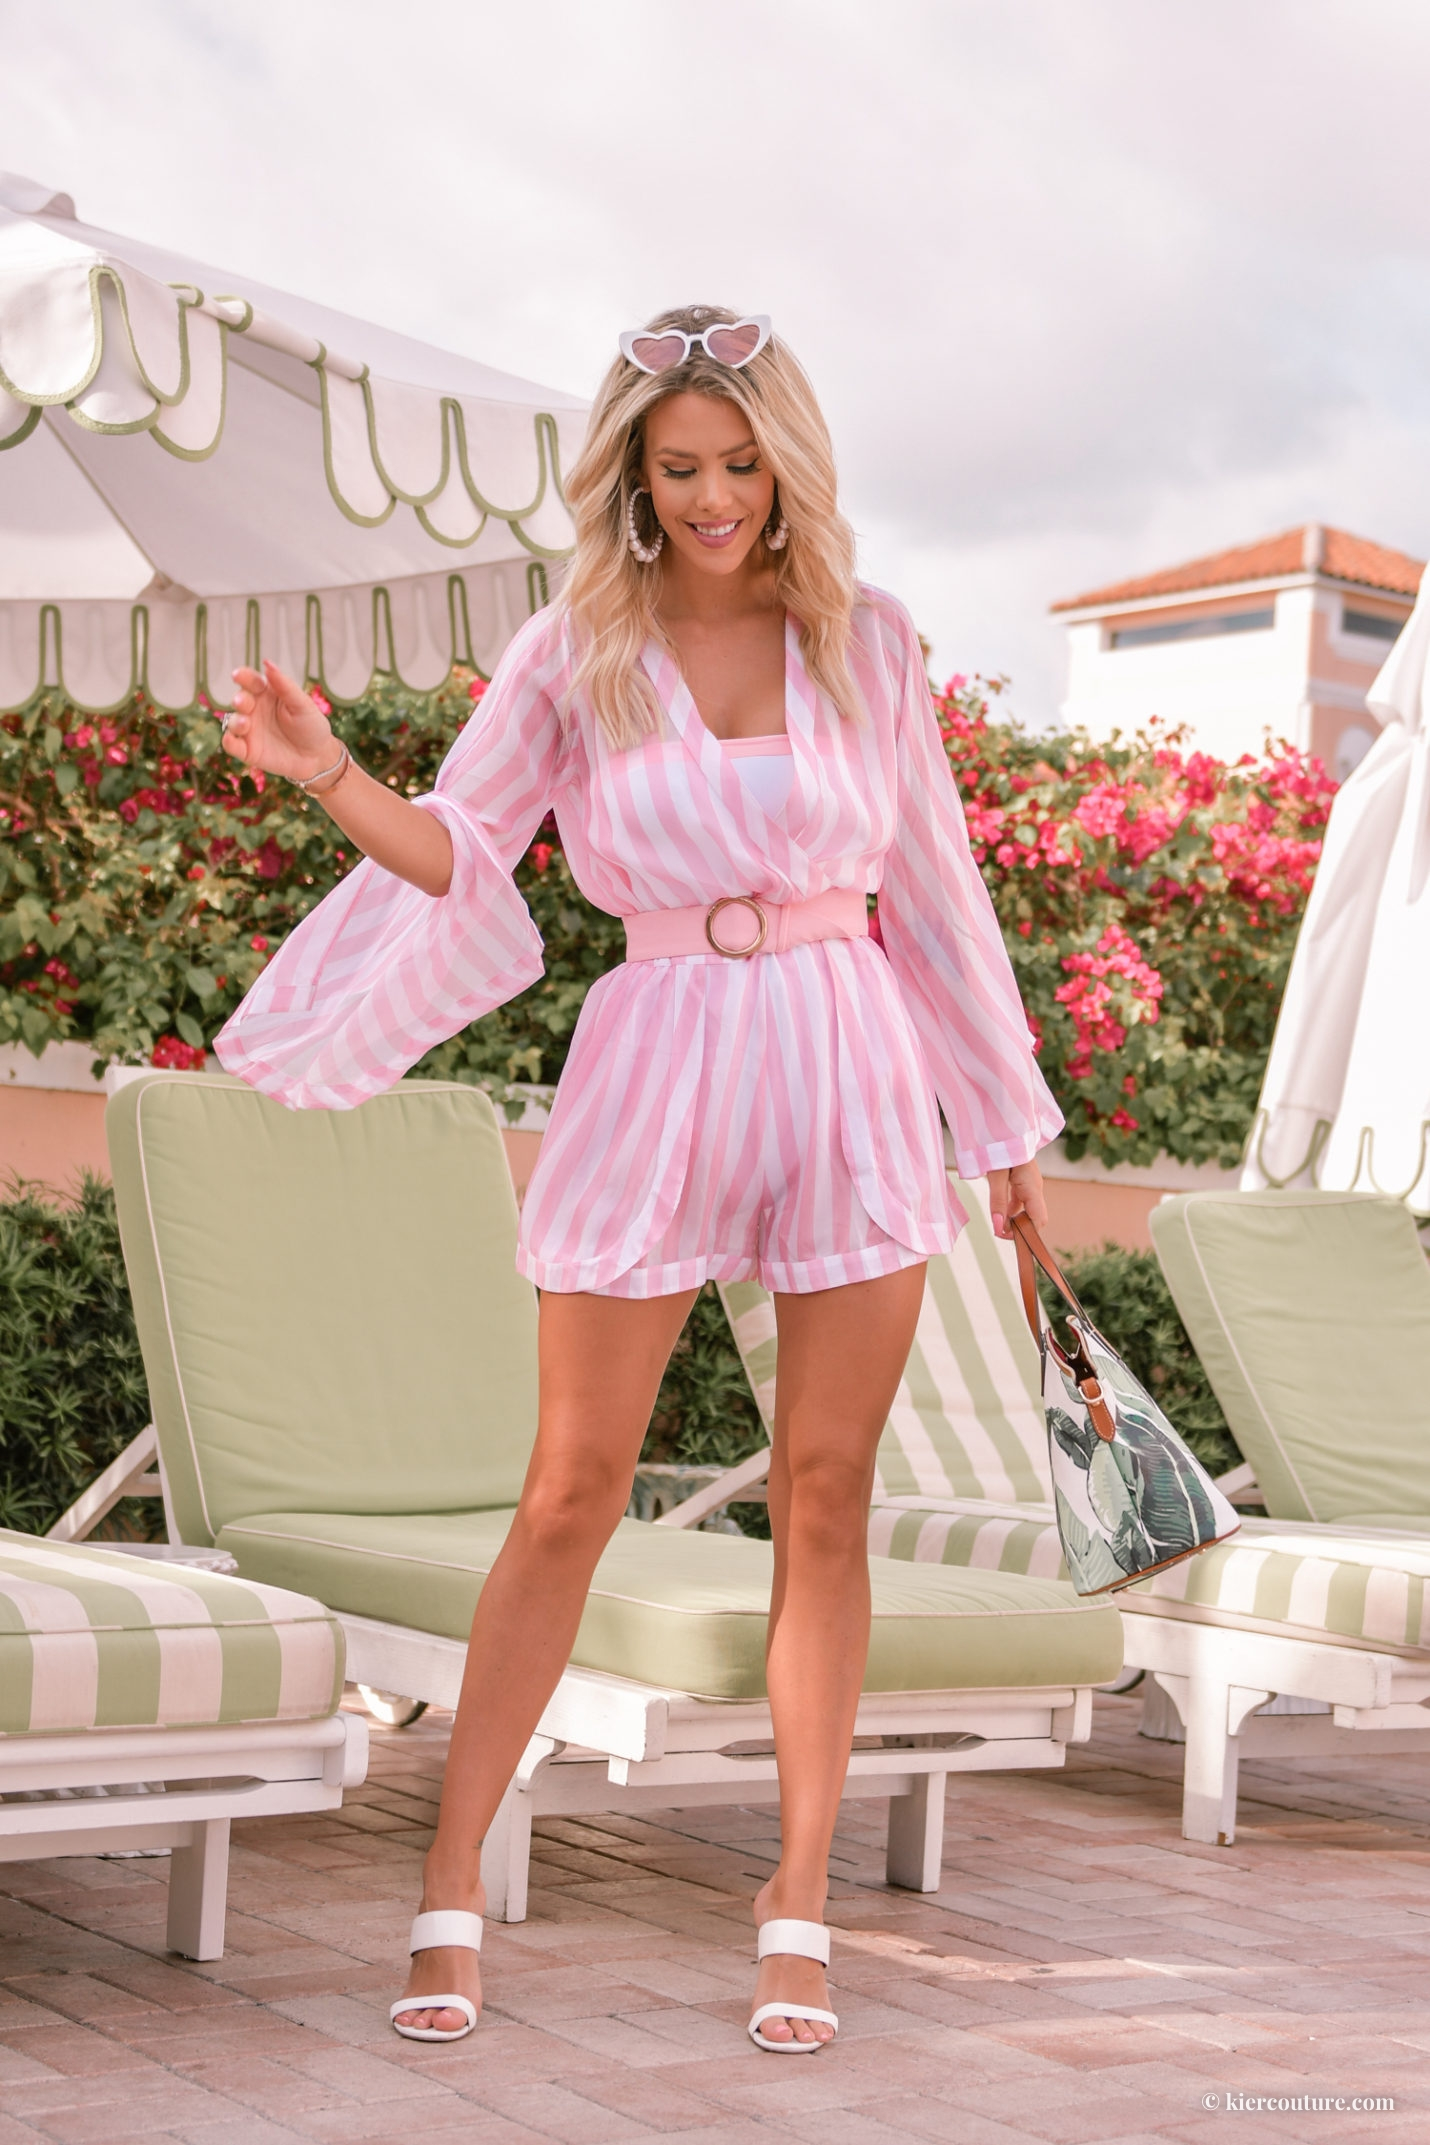 Kier Mellour in Alexandra Miro Candy Stripe Playsuit